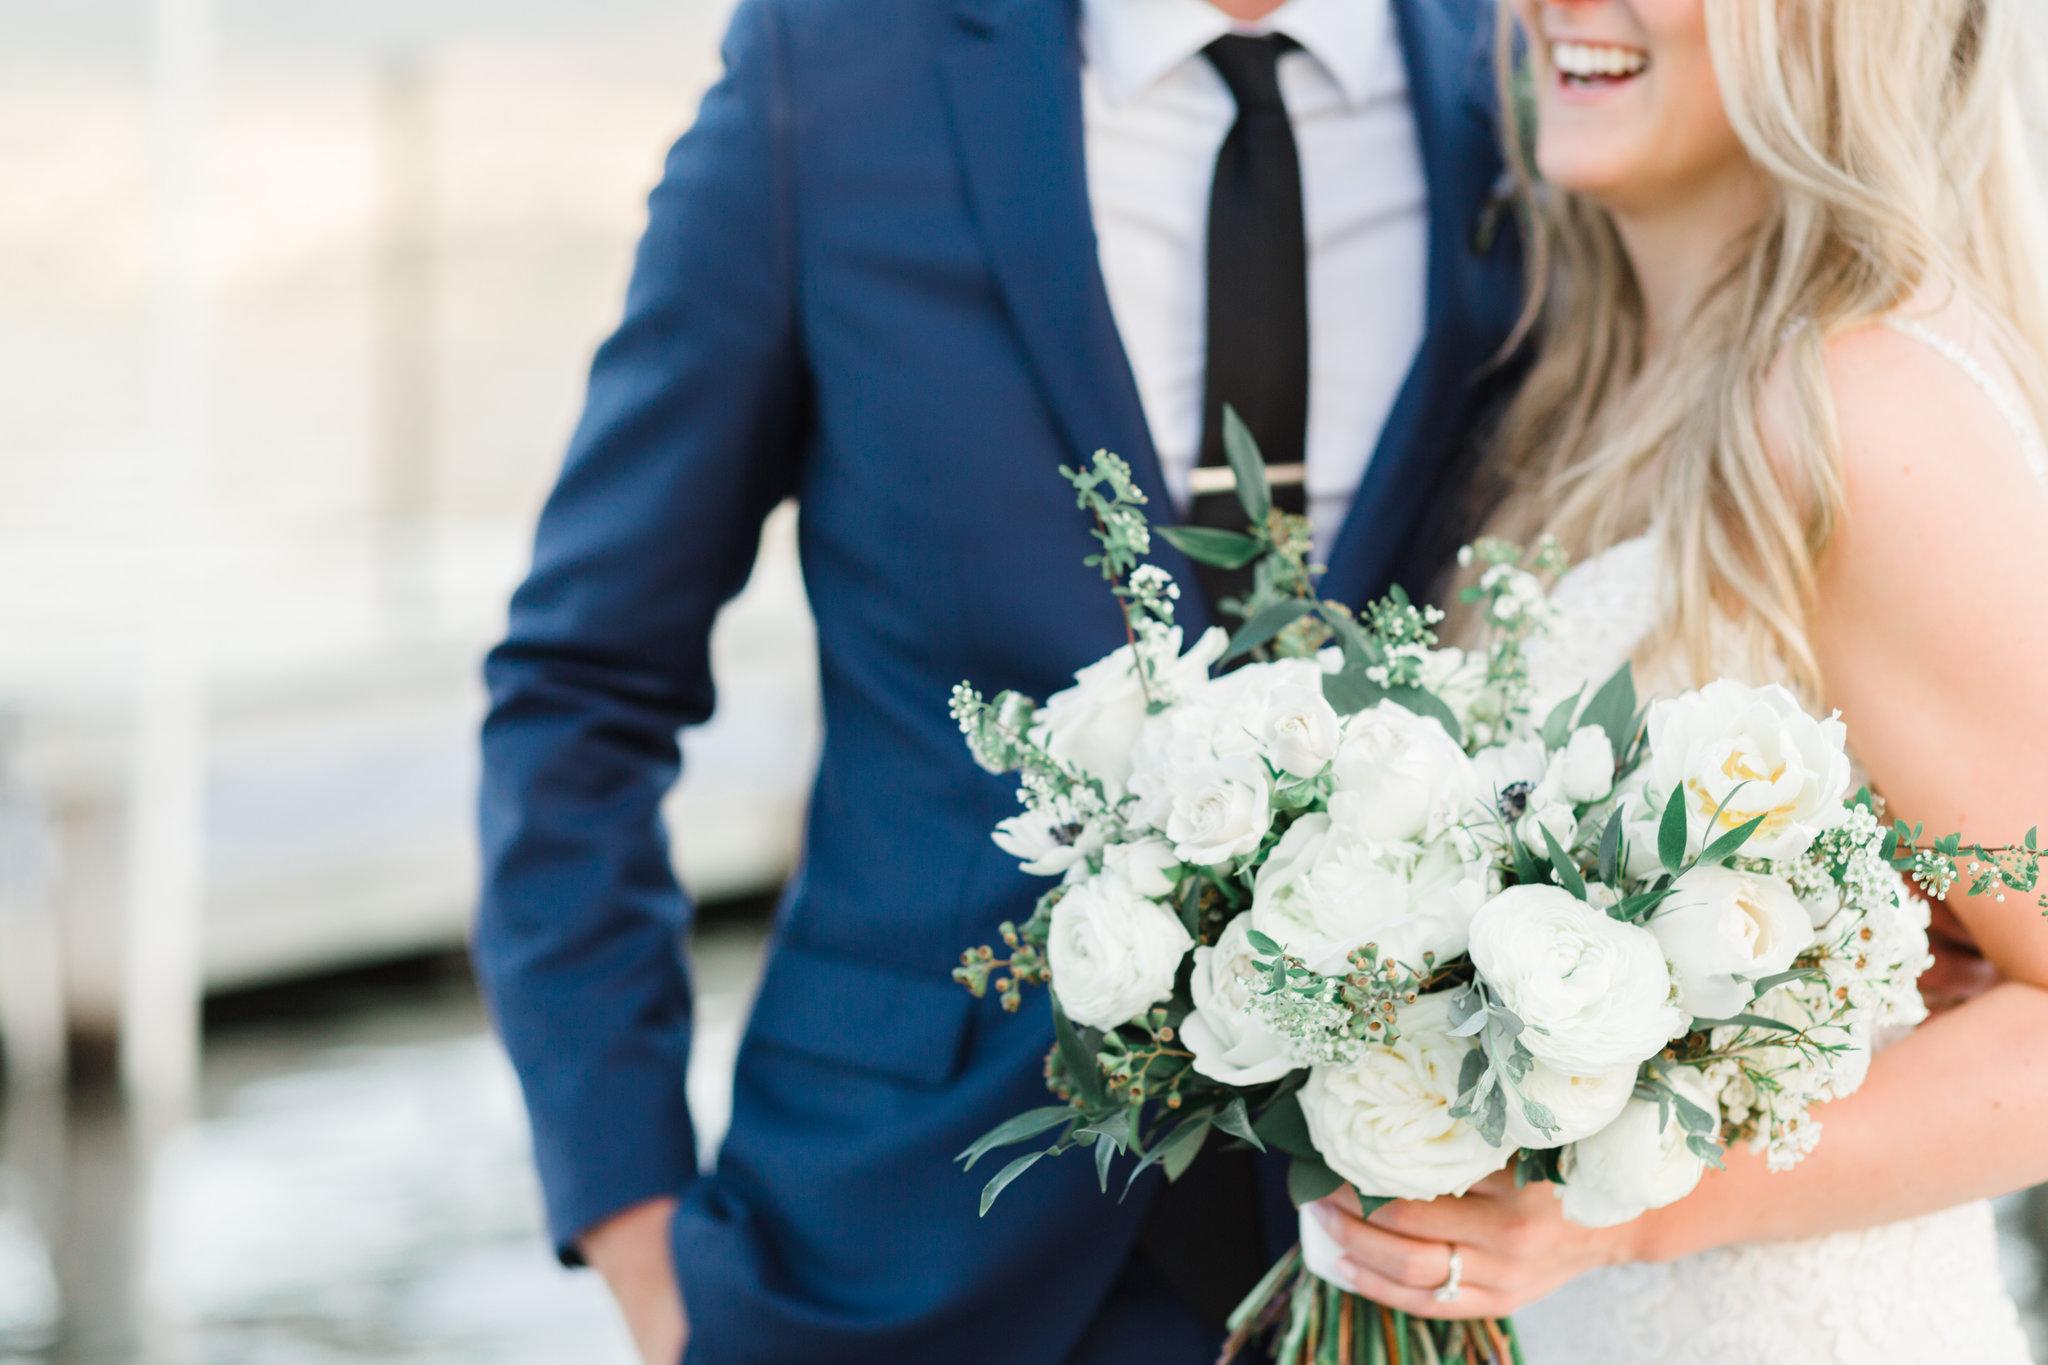 Brittany and Bobby Wedding - Best Wedding Planning under 75k6.jpg